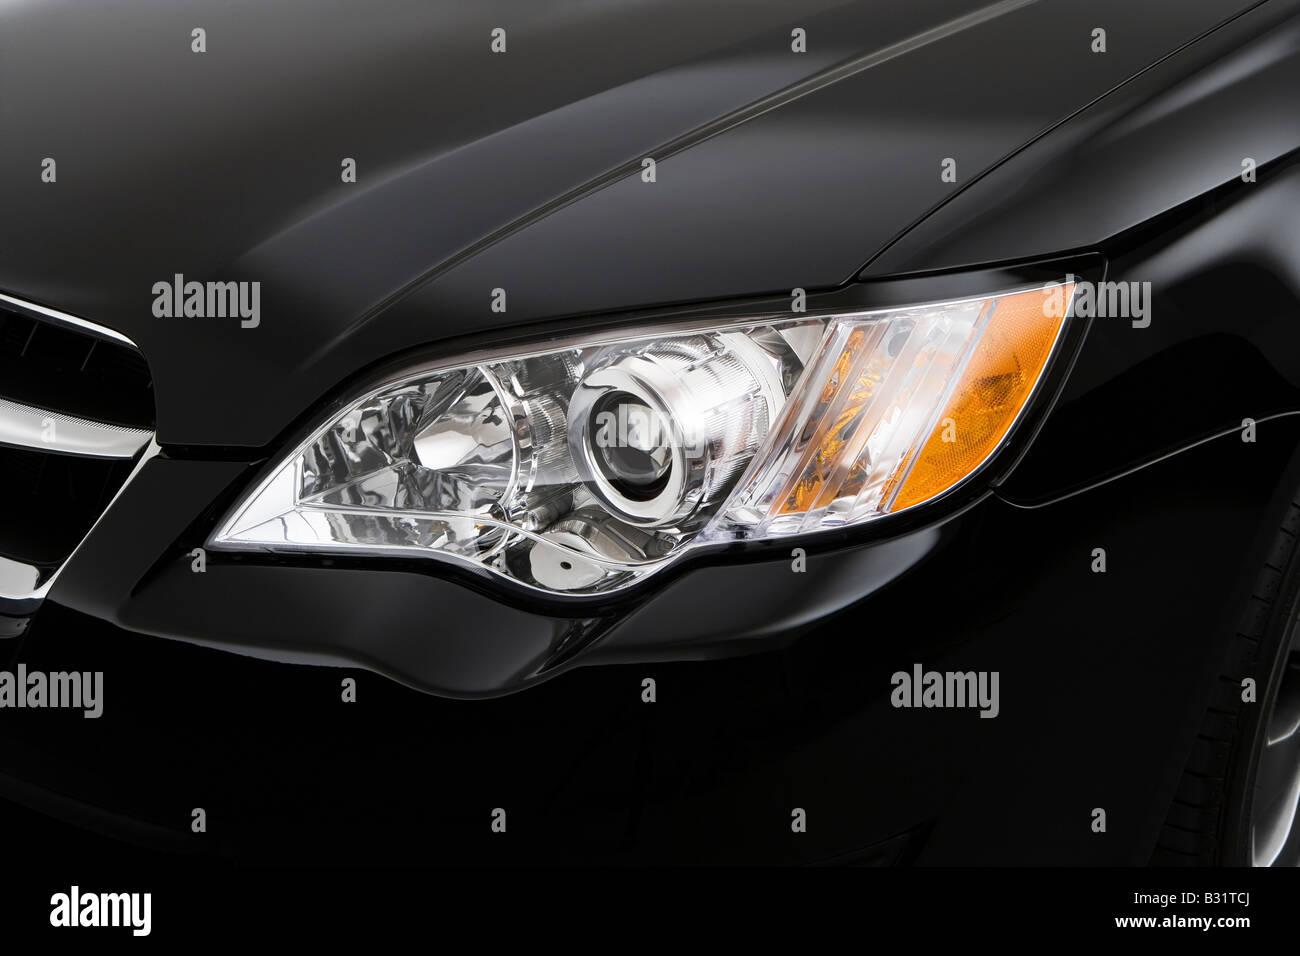 2009 subaru legacy 2 5 gt spec b in black headlight. Black Bedroom Furniture Sets. Home Design Ideas